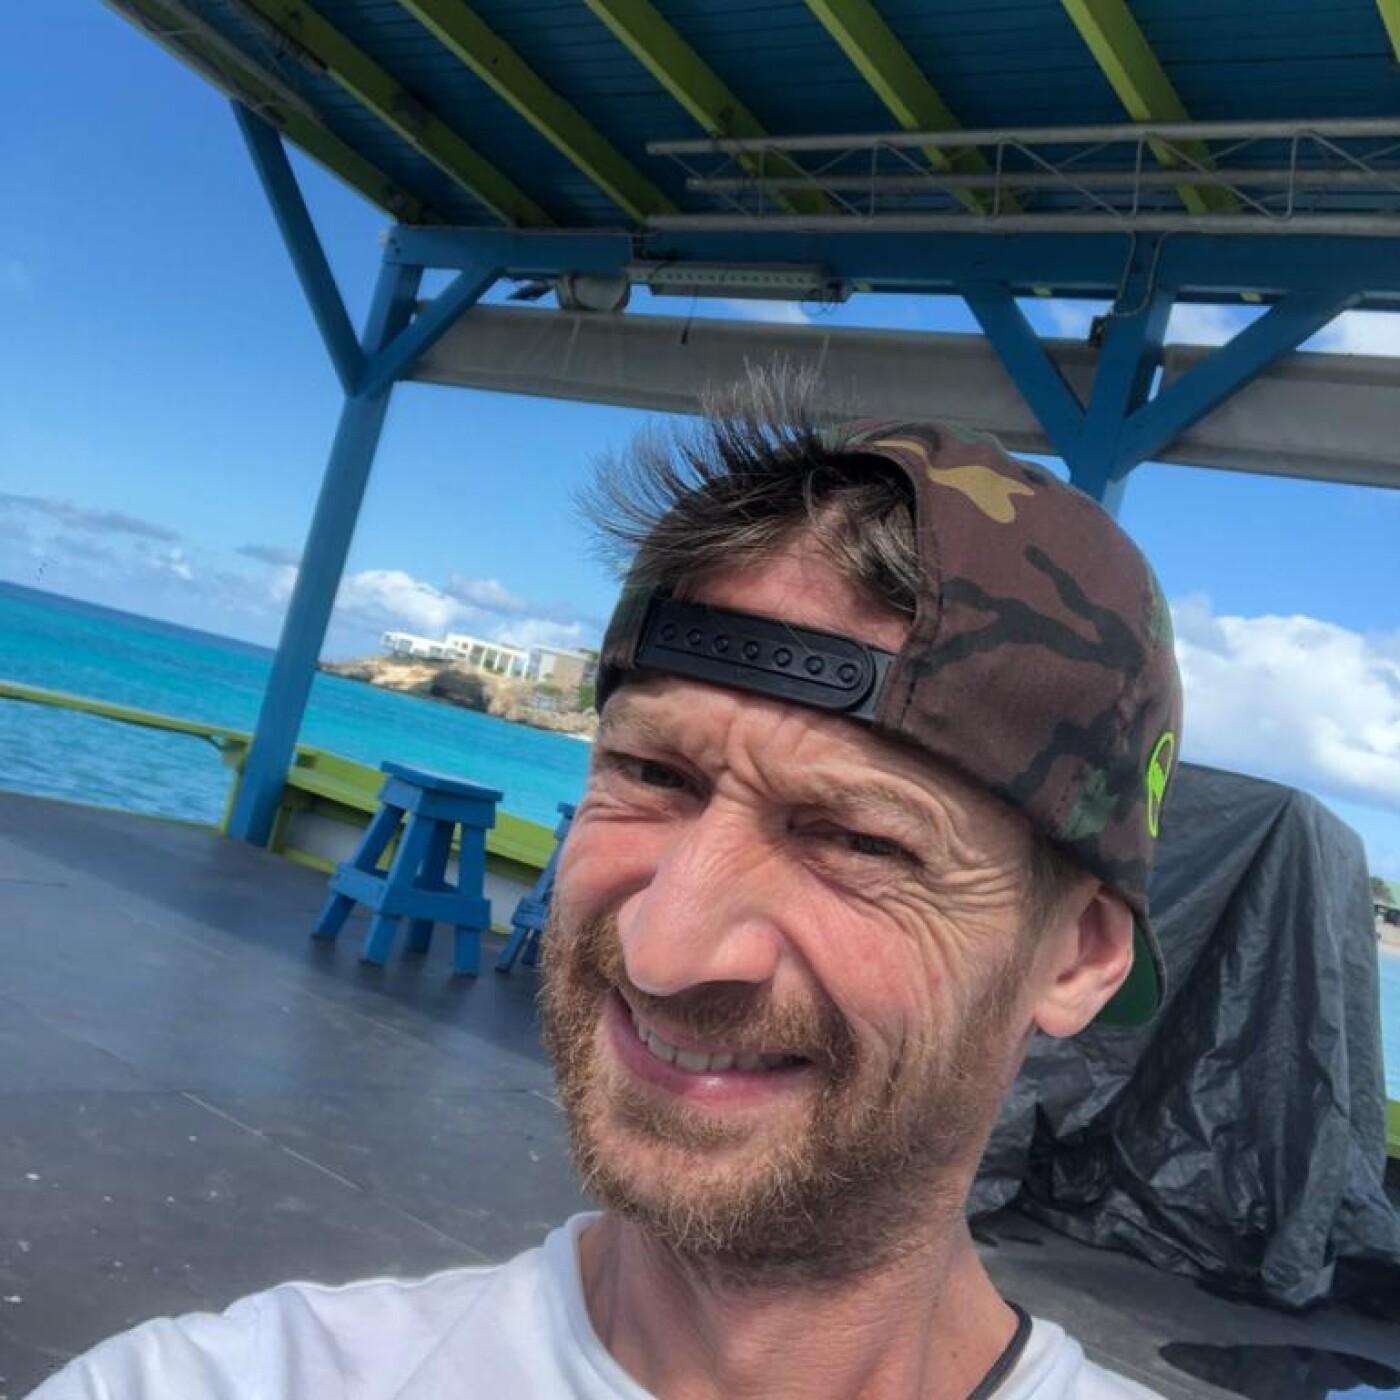 Matthieu raconte son installation a st Martin et parle d'Irma - 28 03 2021 - StereoChic Radio